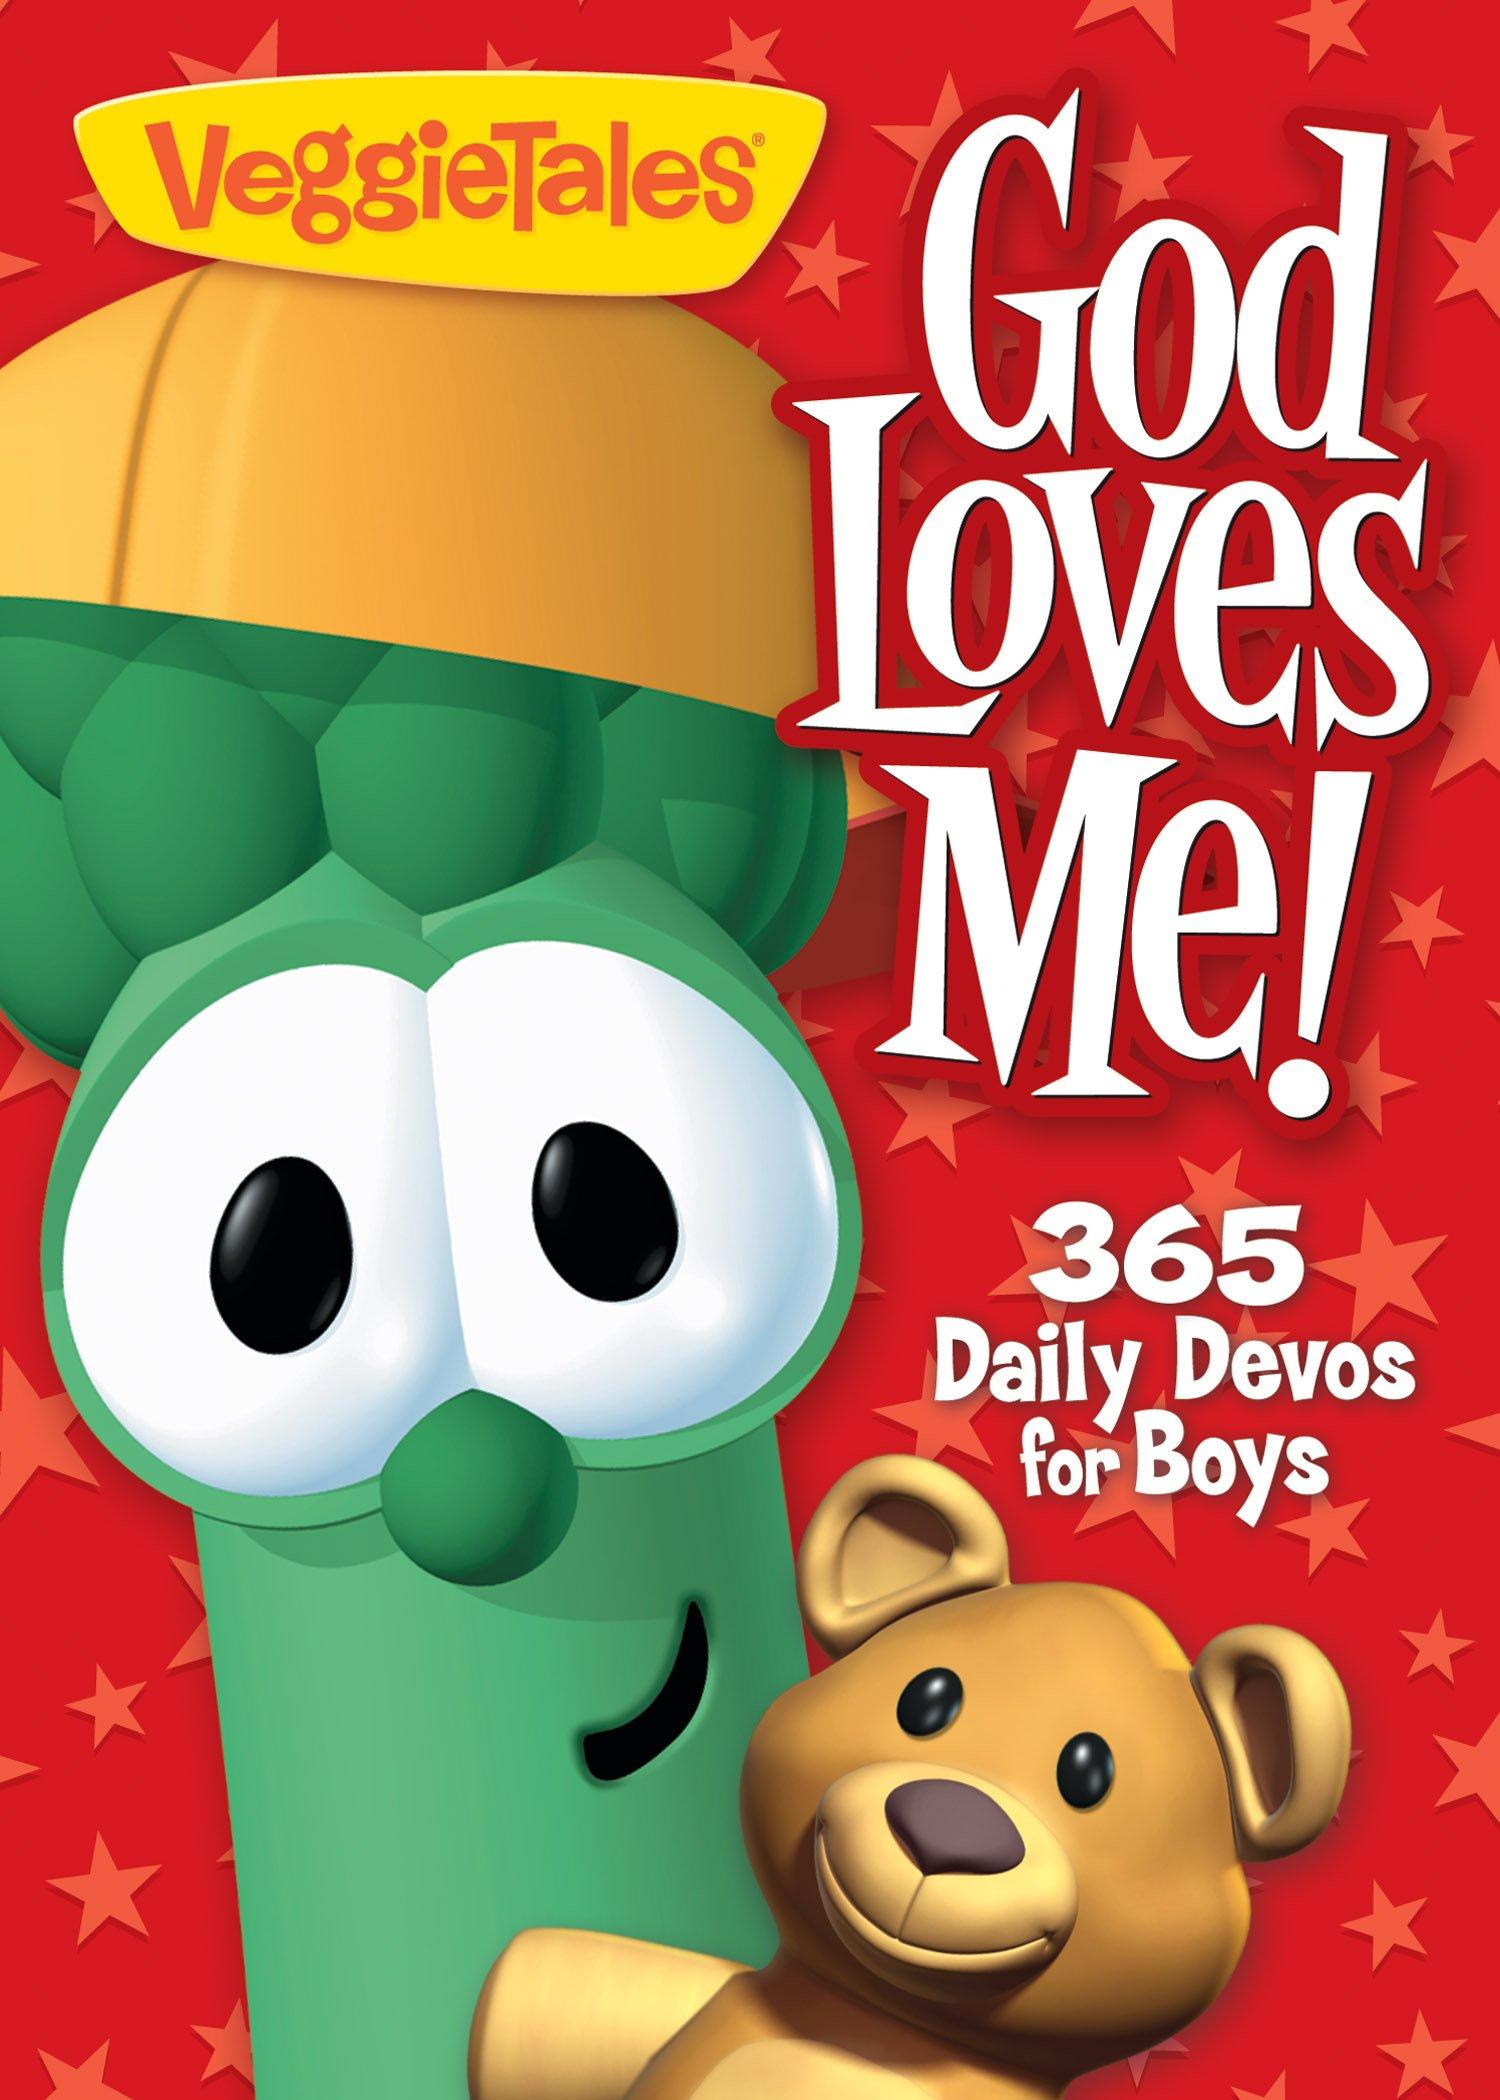 365 Daily Devos for Boys (Veggietales) Paperback – June 26, 2012